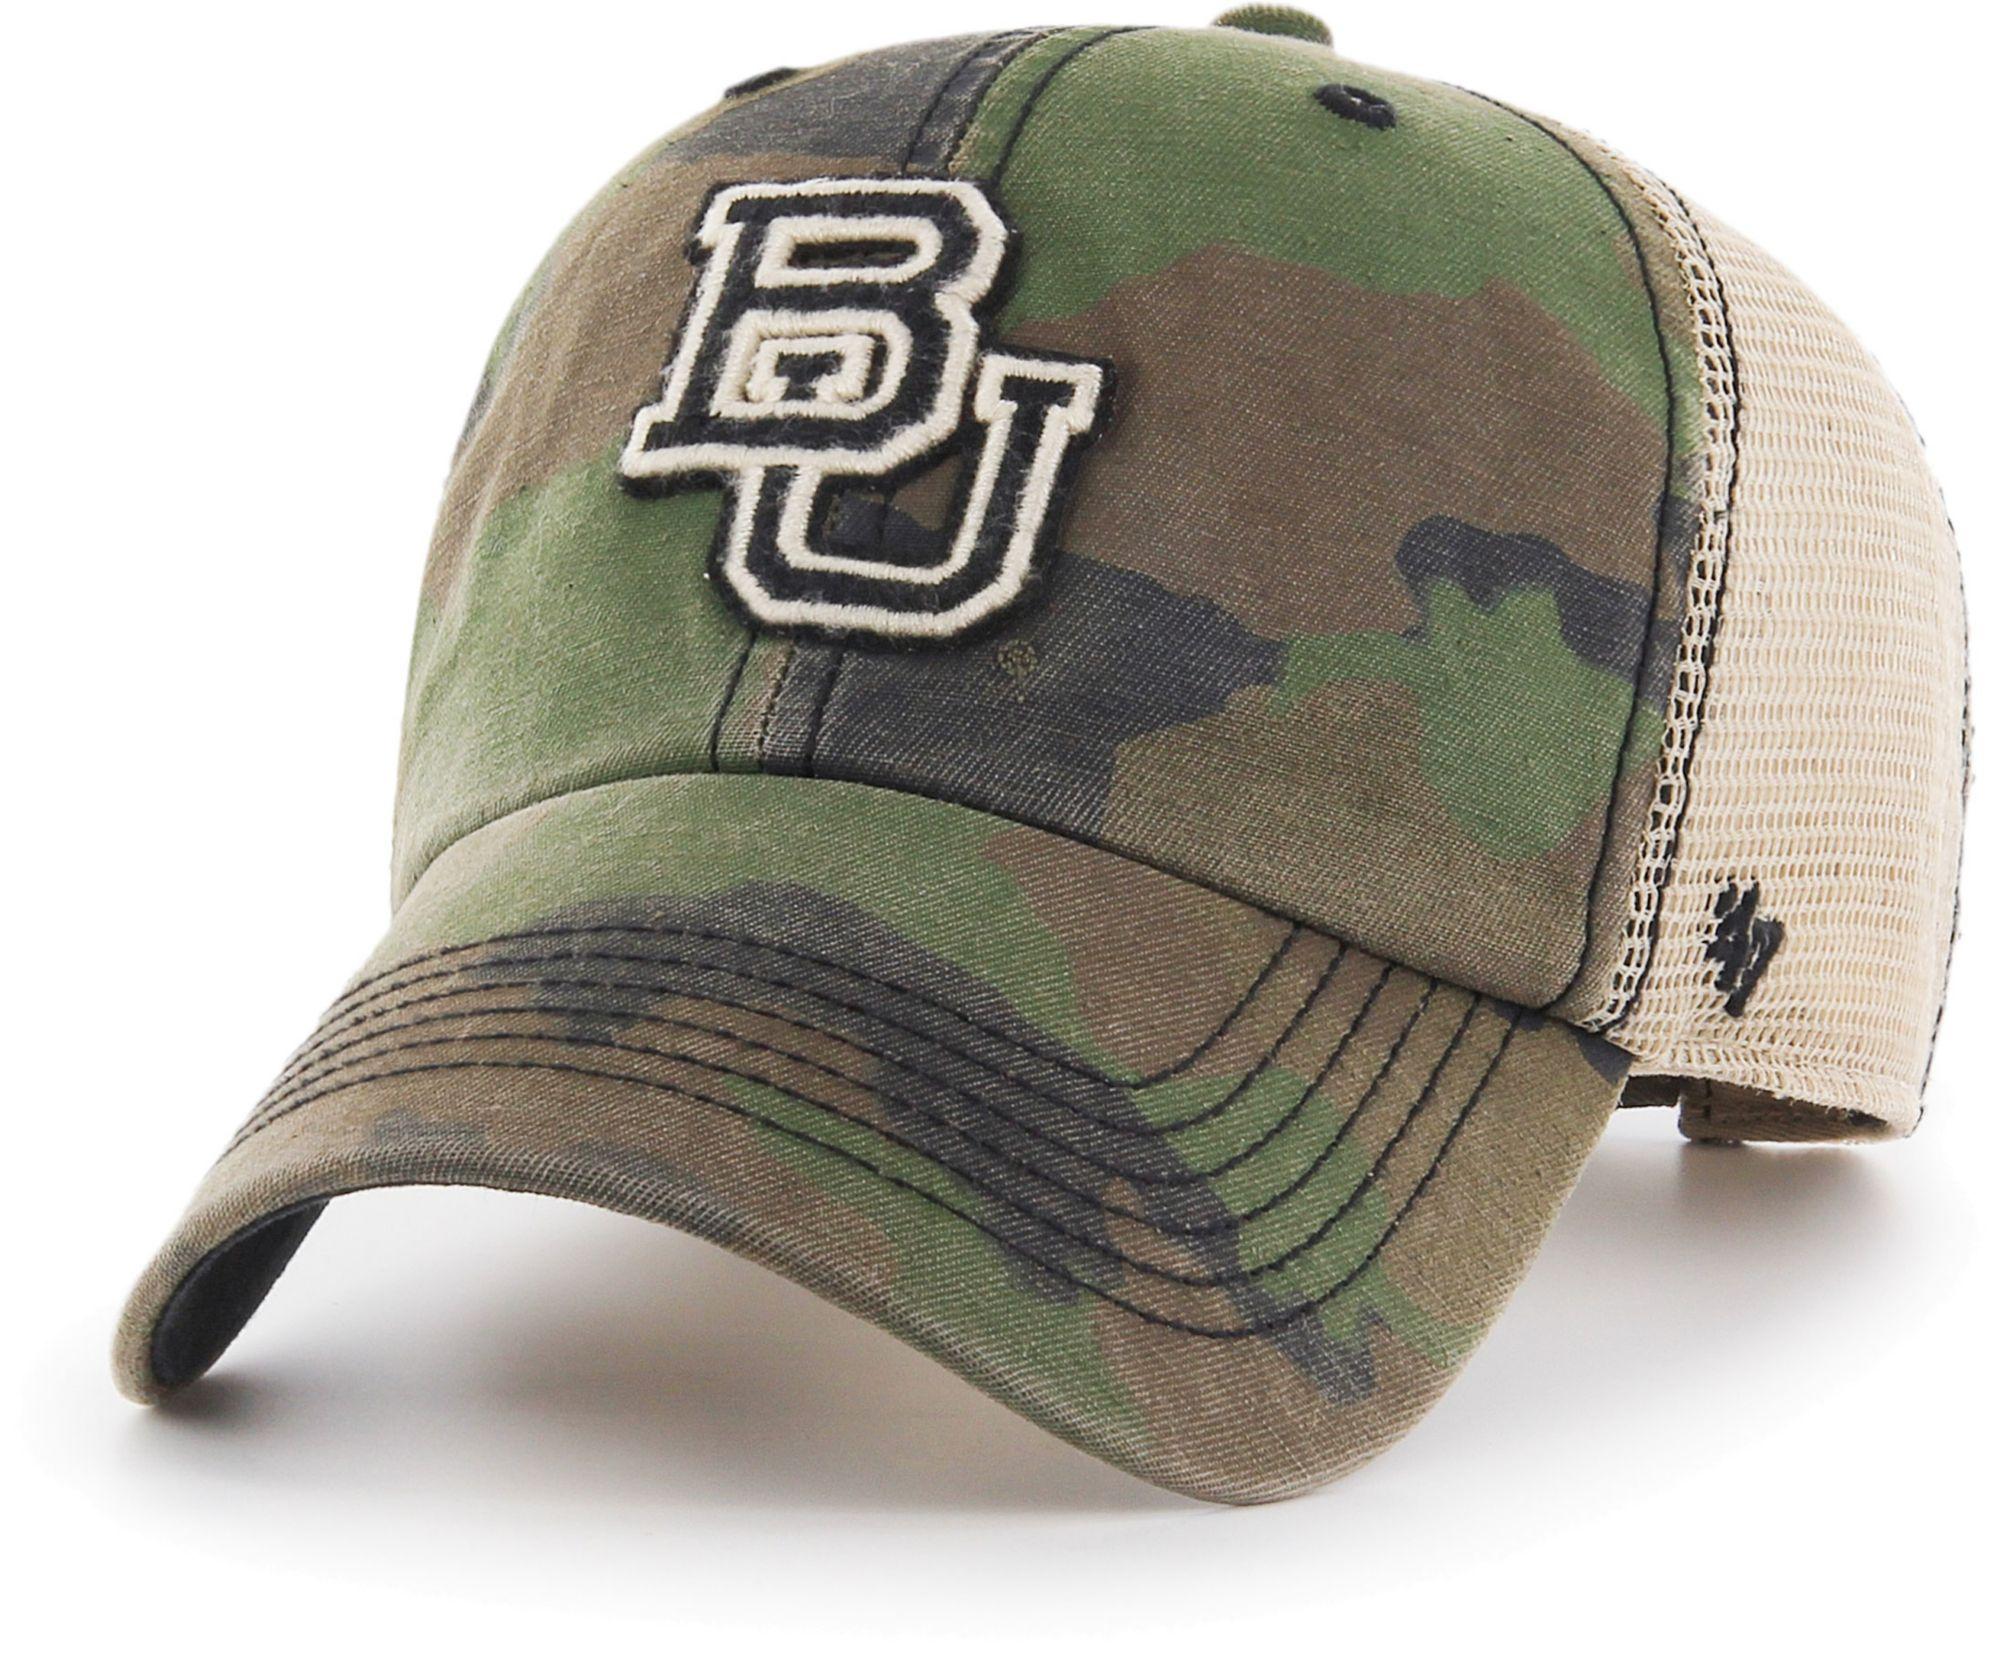 '47 Men's Baylor Camo Burnett Clean Up Adjustable Hat, Size: One size, Green thumbnail